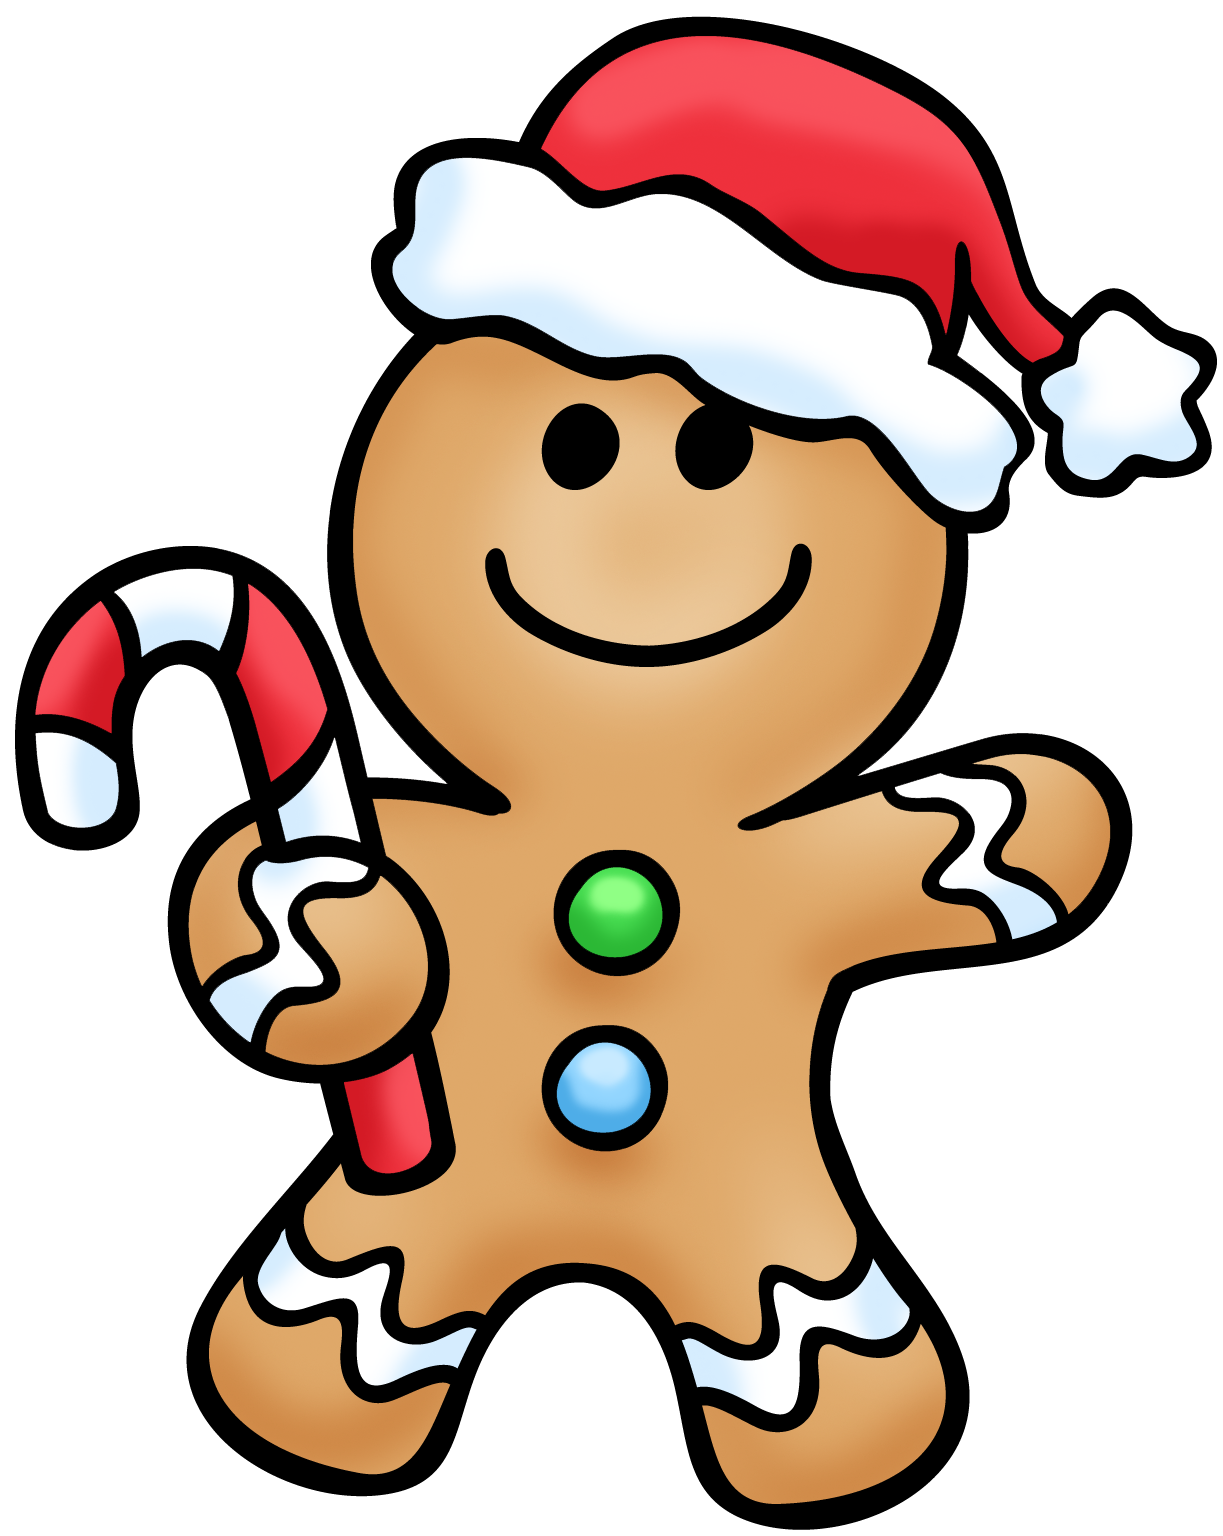 Christmas Gingerbread Man Clipart - Clipart Kid